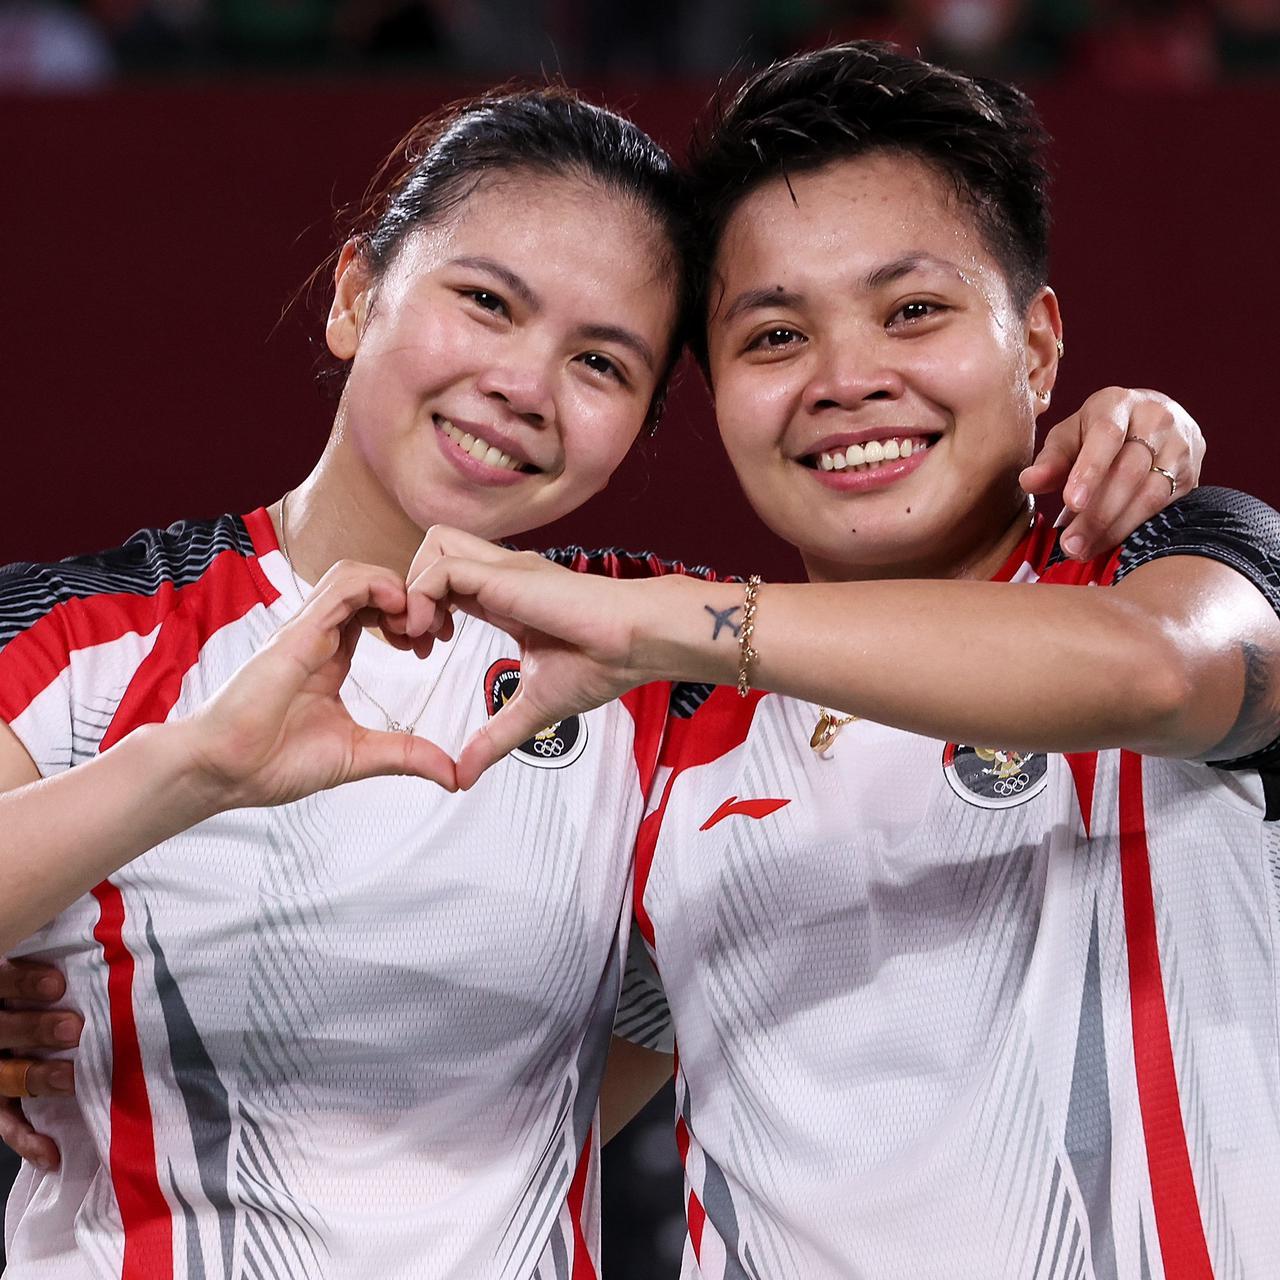 Pasangan ganda putri bulutangkis Indonesia, Greysia Polii dan Apriyani Rahayu (sumberf oto: Olympics.com)